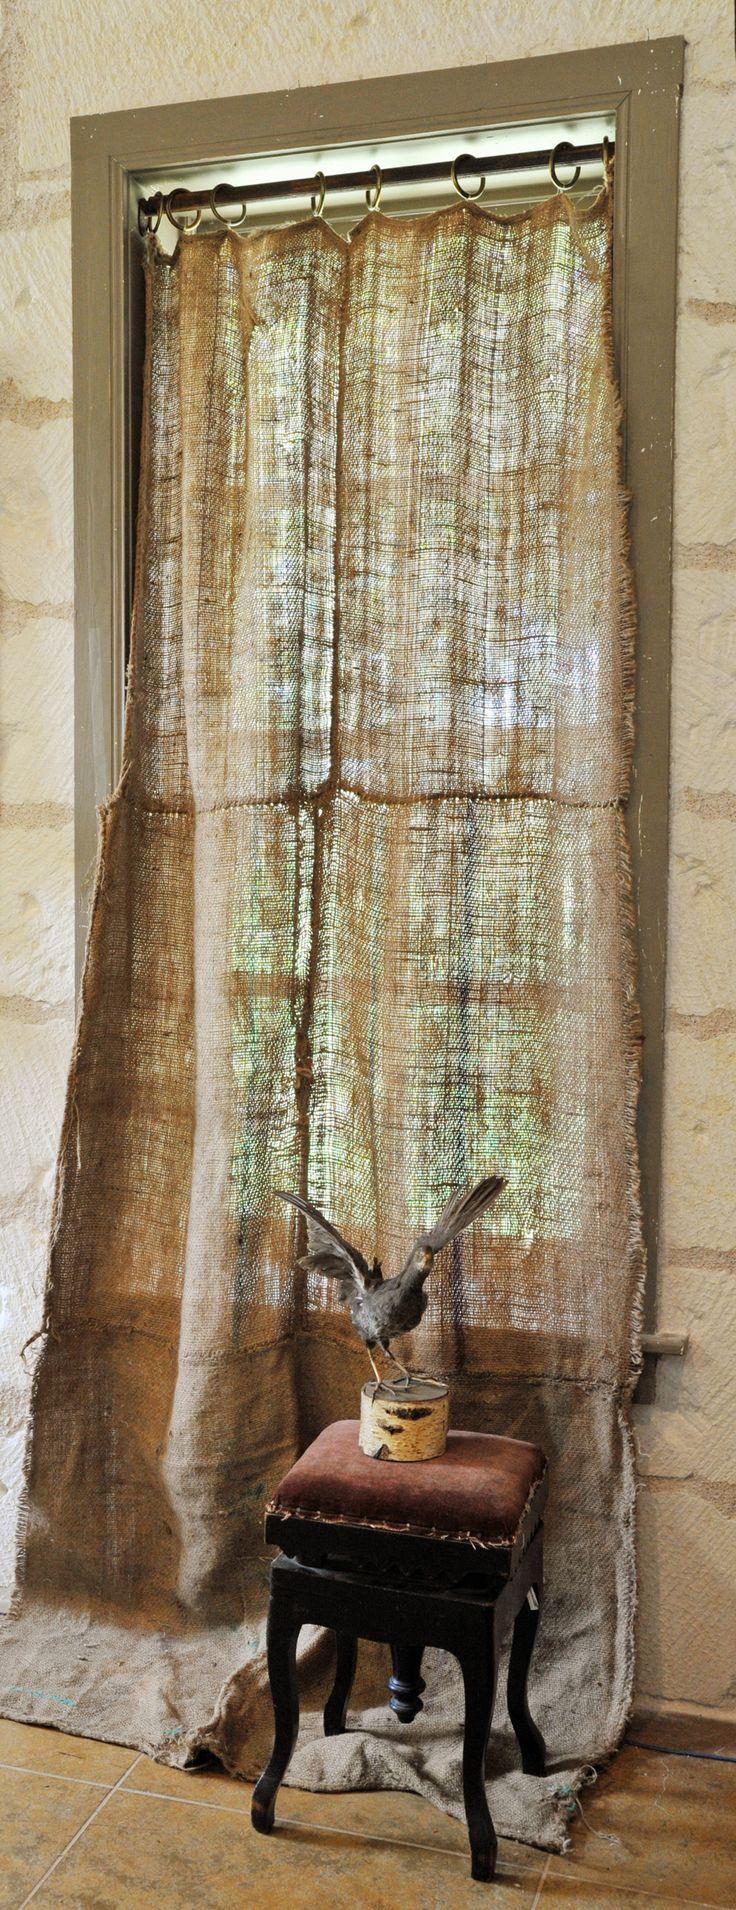 Burlap Curtains at Carol Hicks Bolton